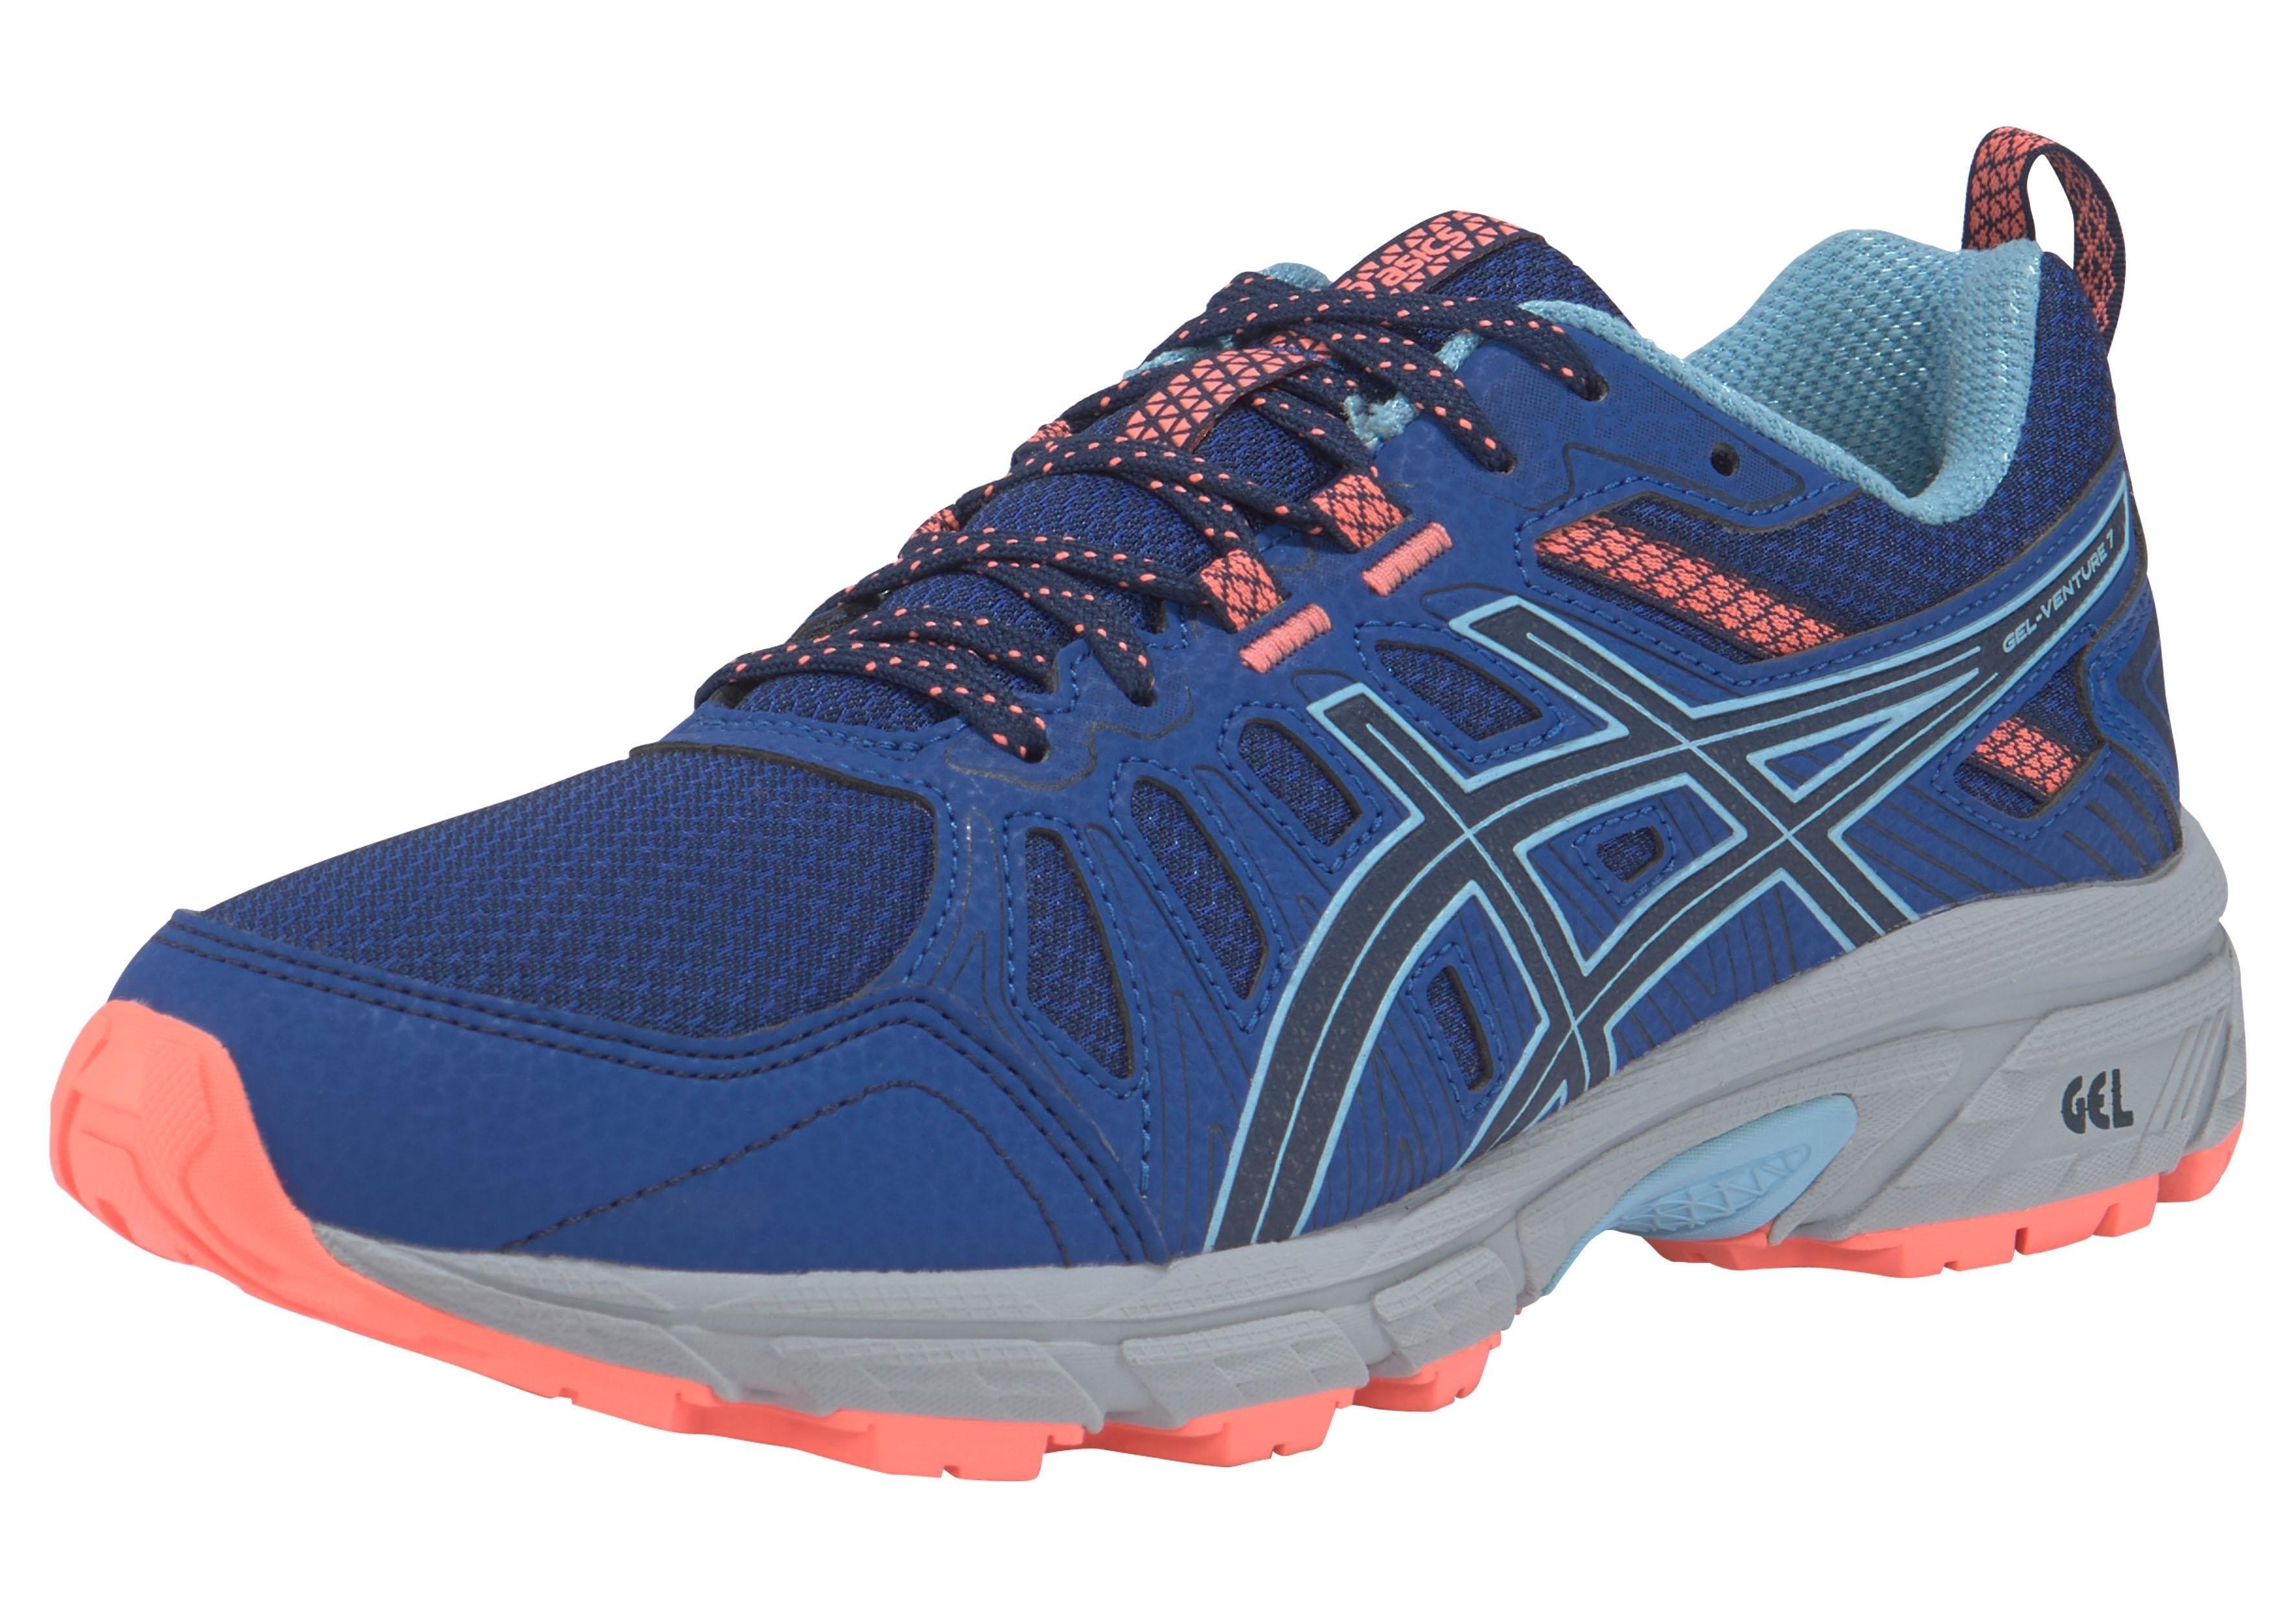 asics runningschoenen »Gel Venture 7« nu online bestellen